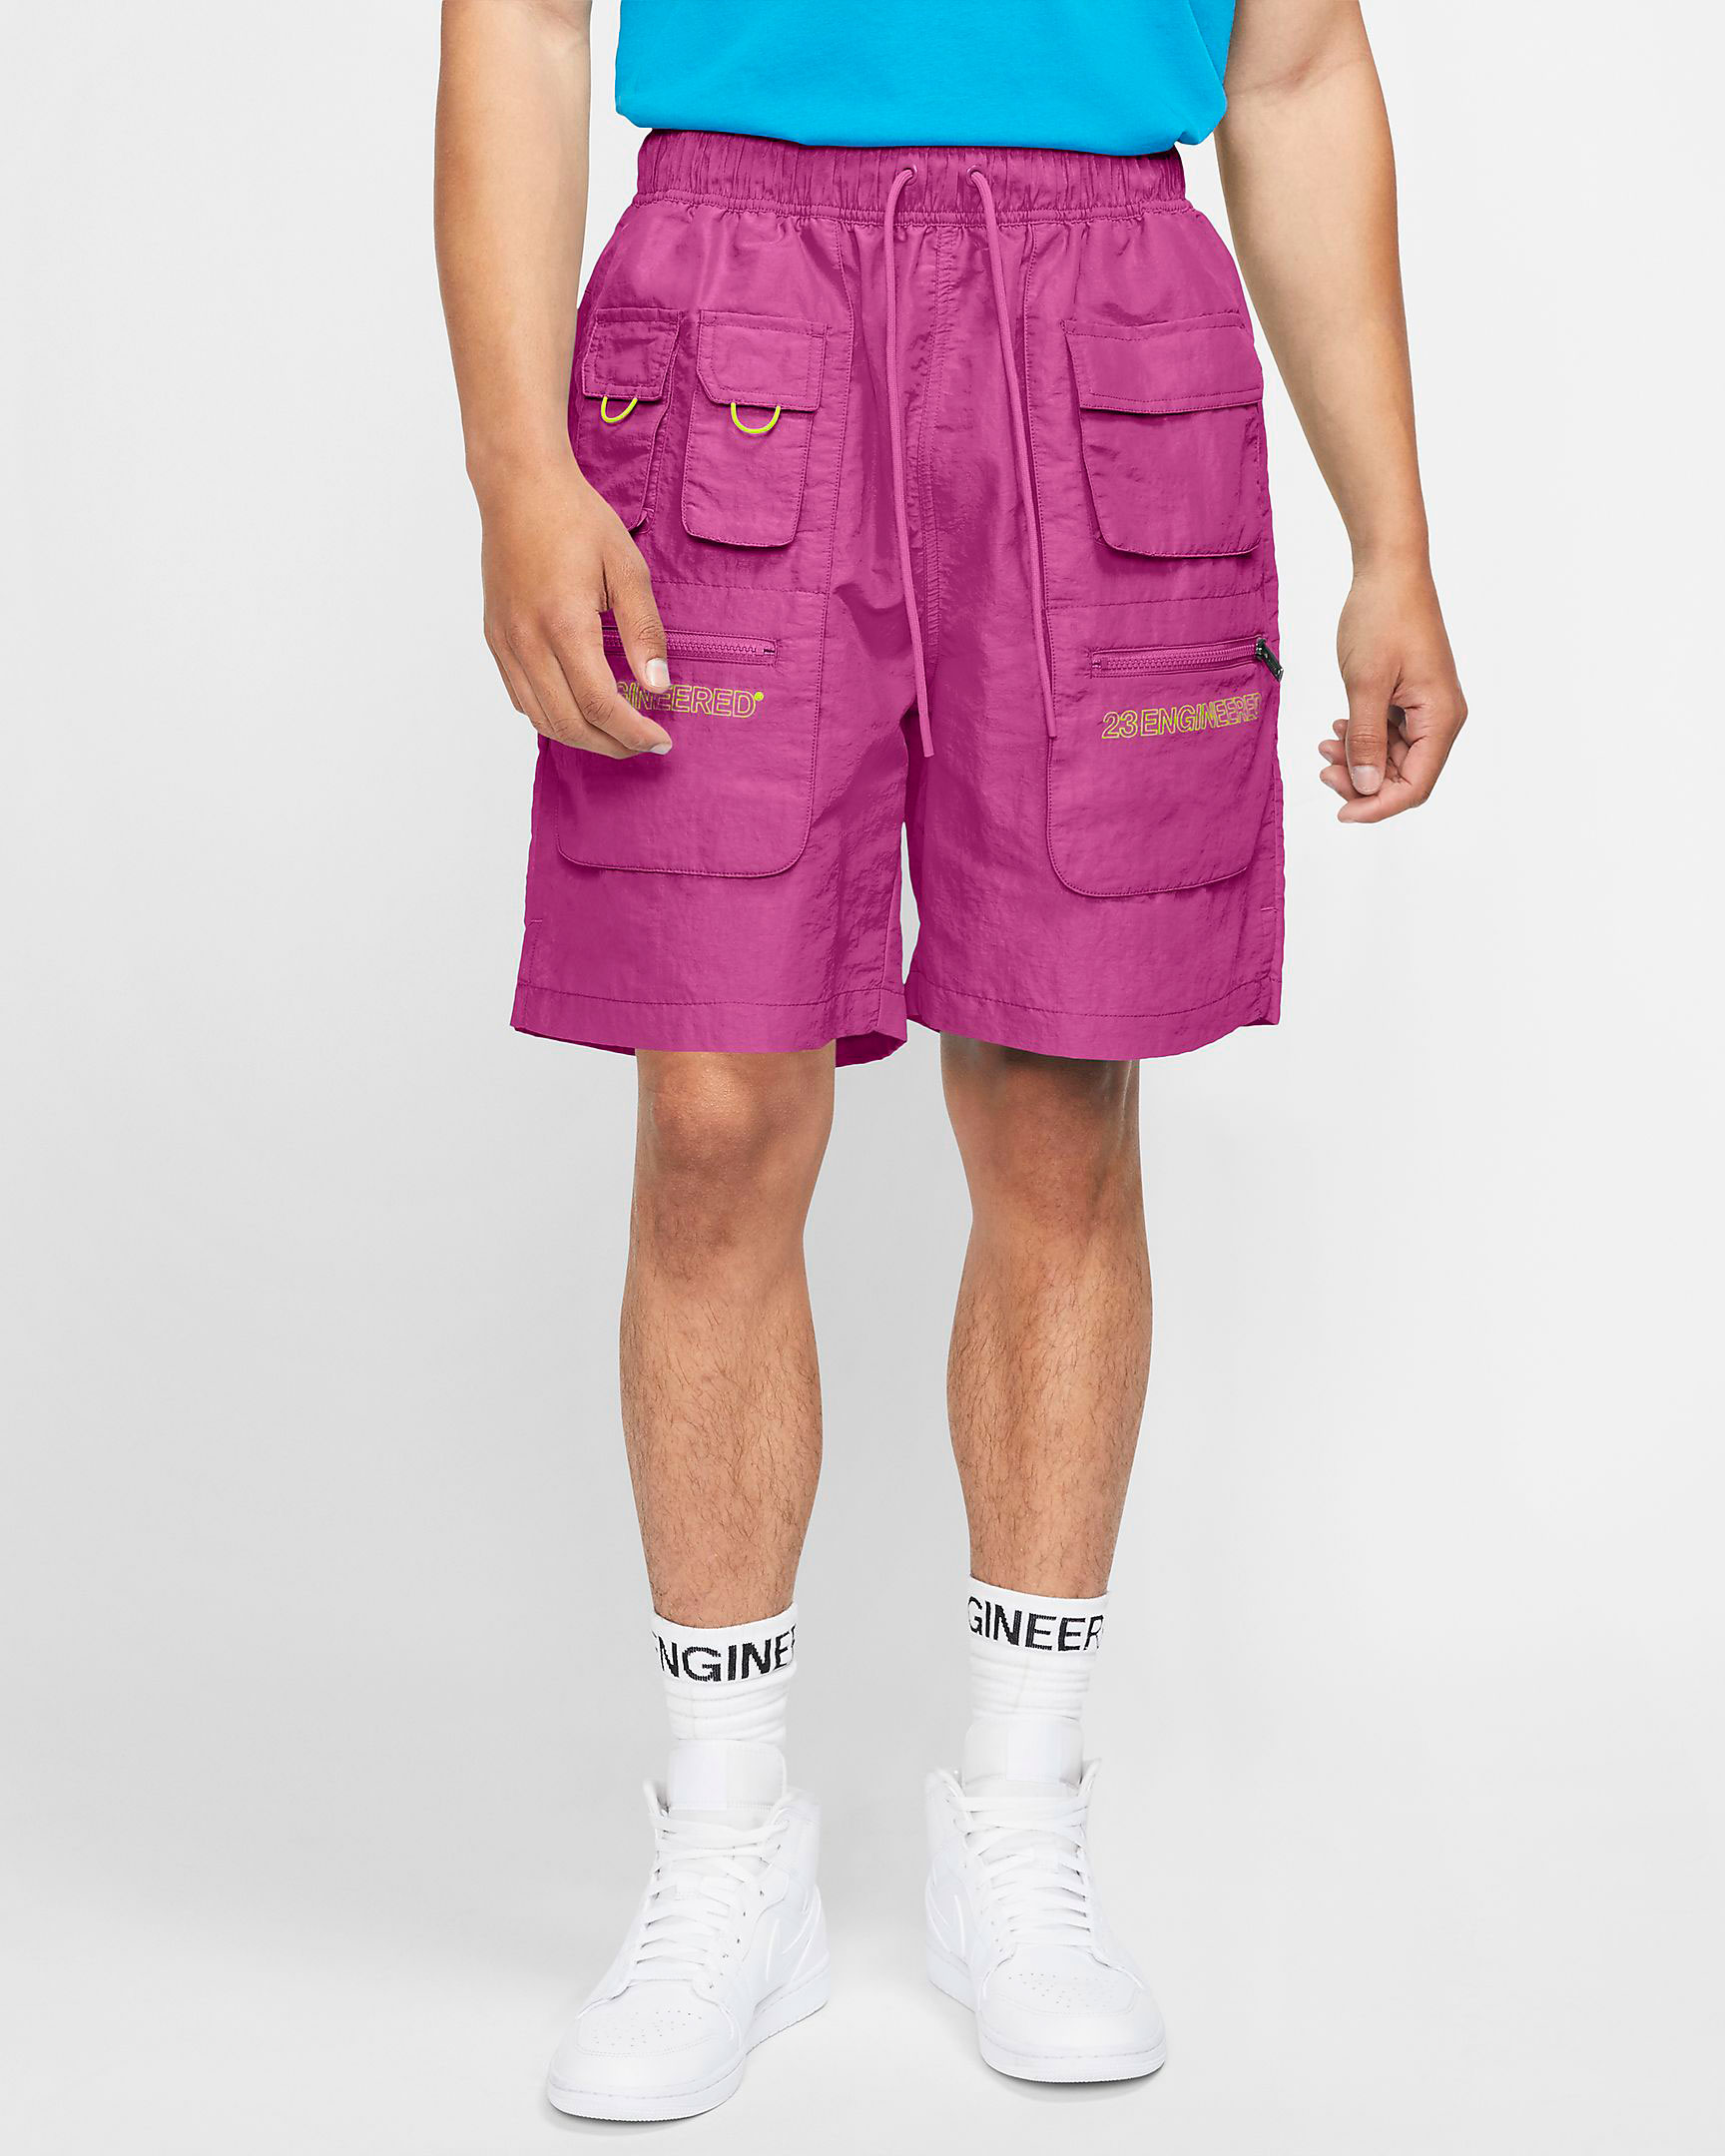 jordan-23-engineered-fuchsia-shorts